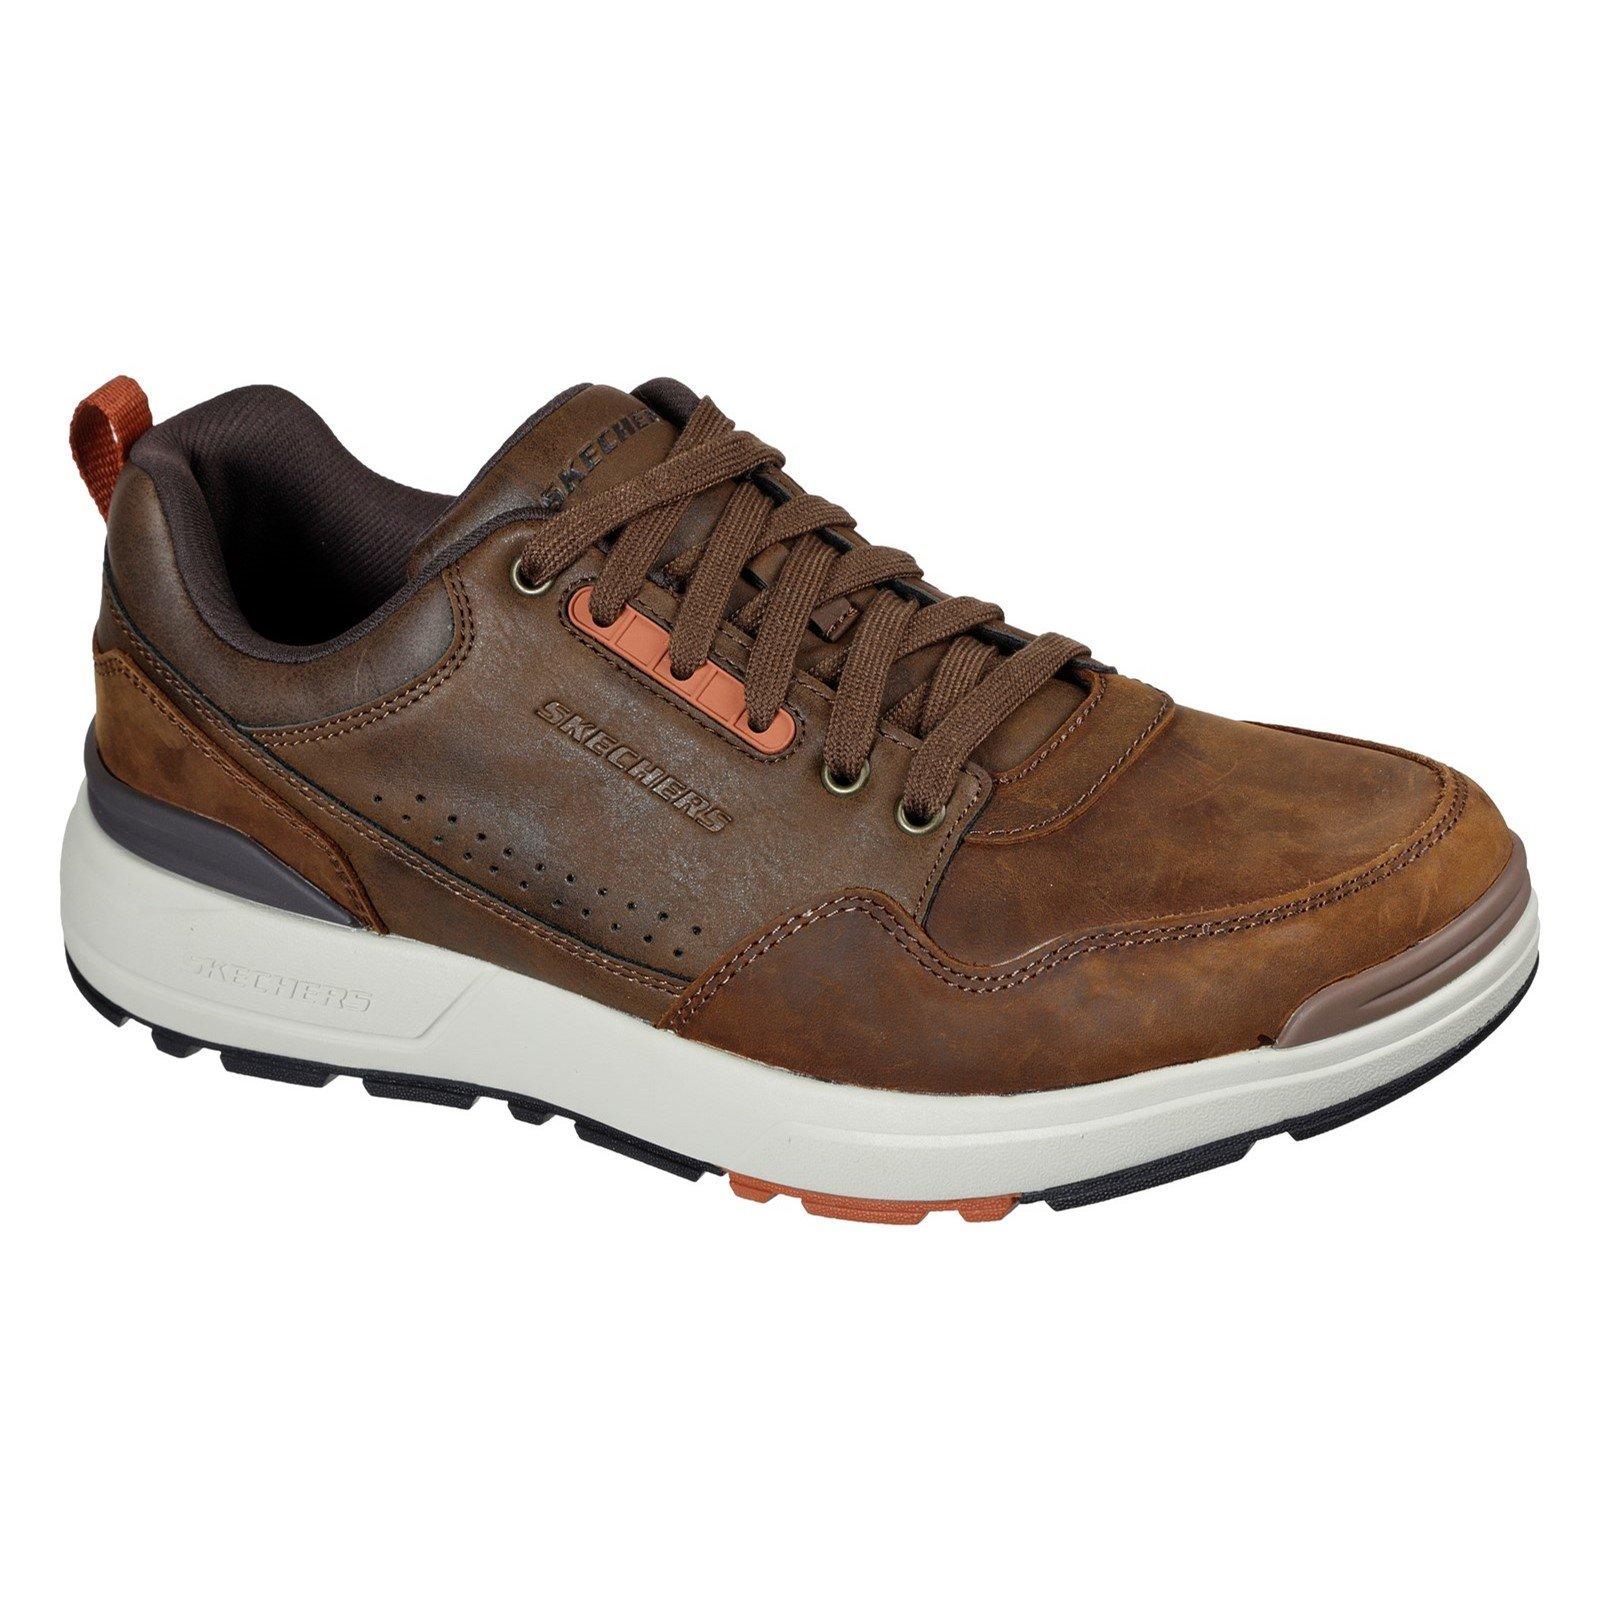 Skechers Men's Rozier Mancer Trainer Multicolor 32450 - Chocolate/Dark Brown 9